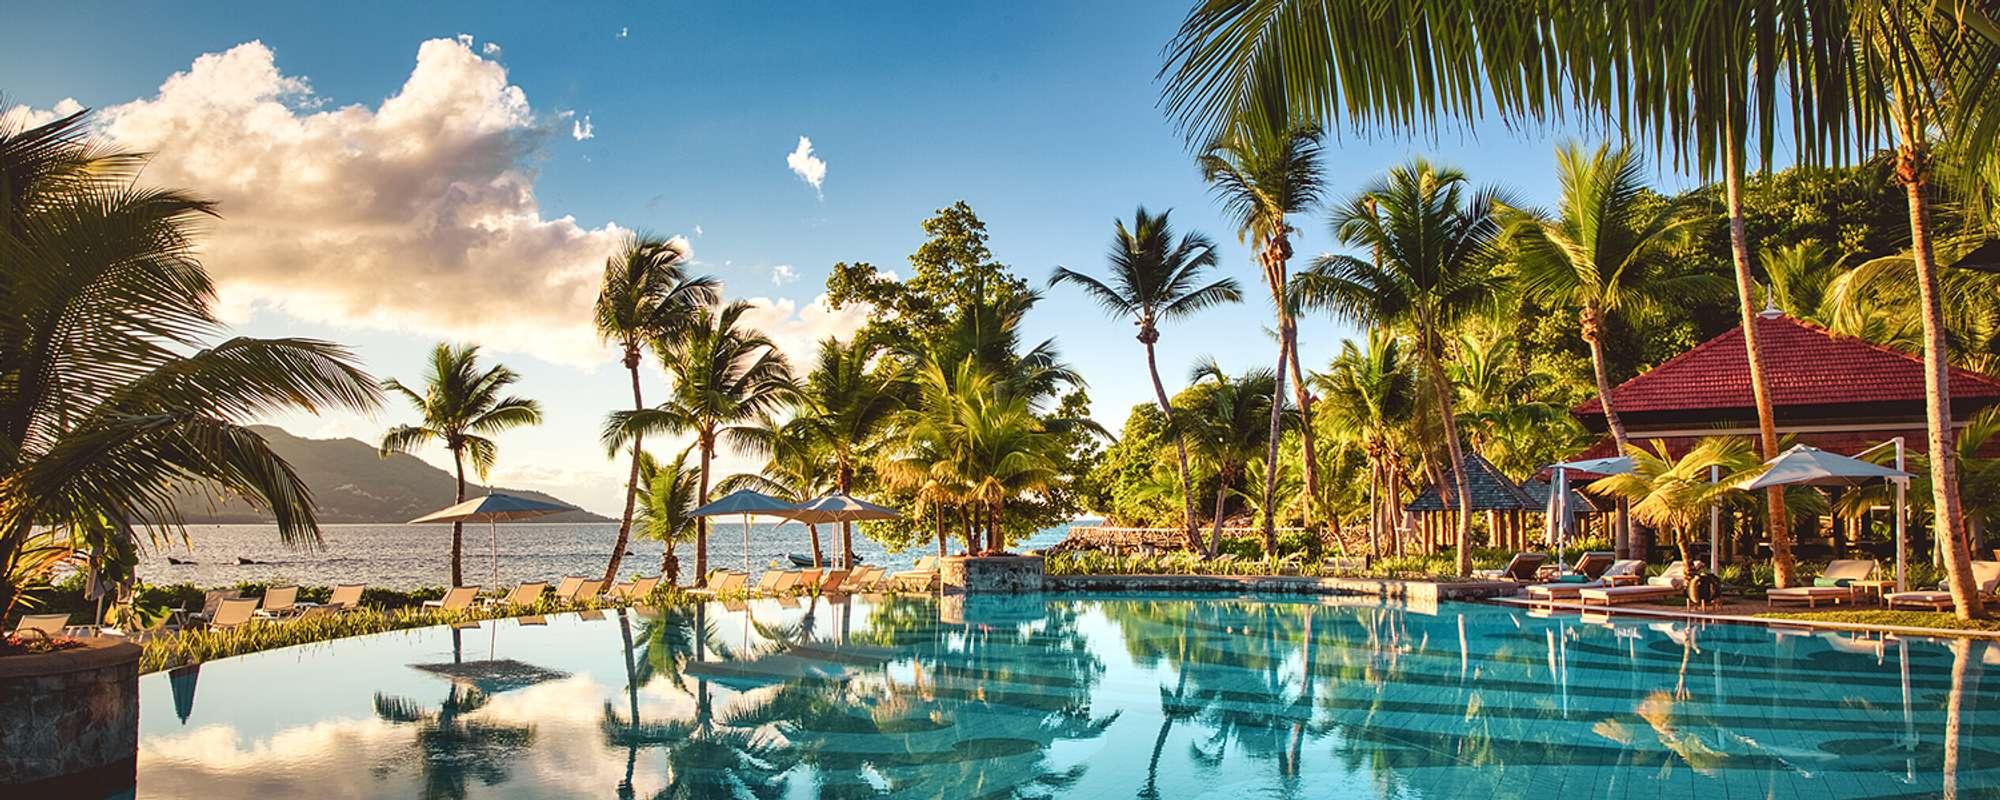 New resort in Seychelles